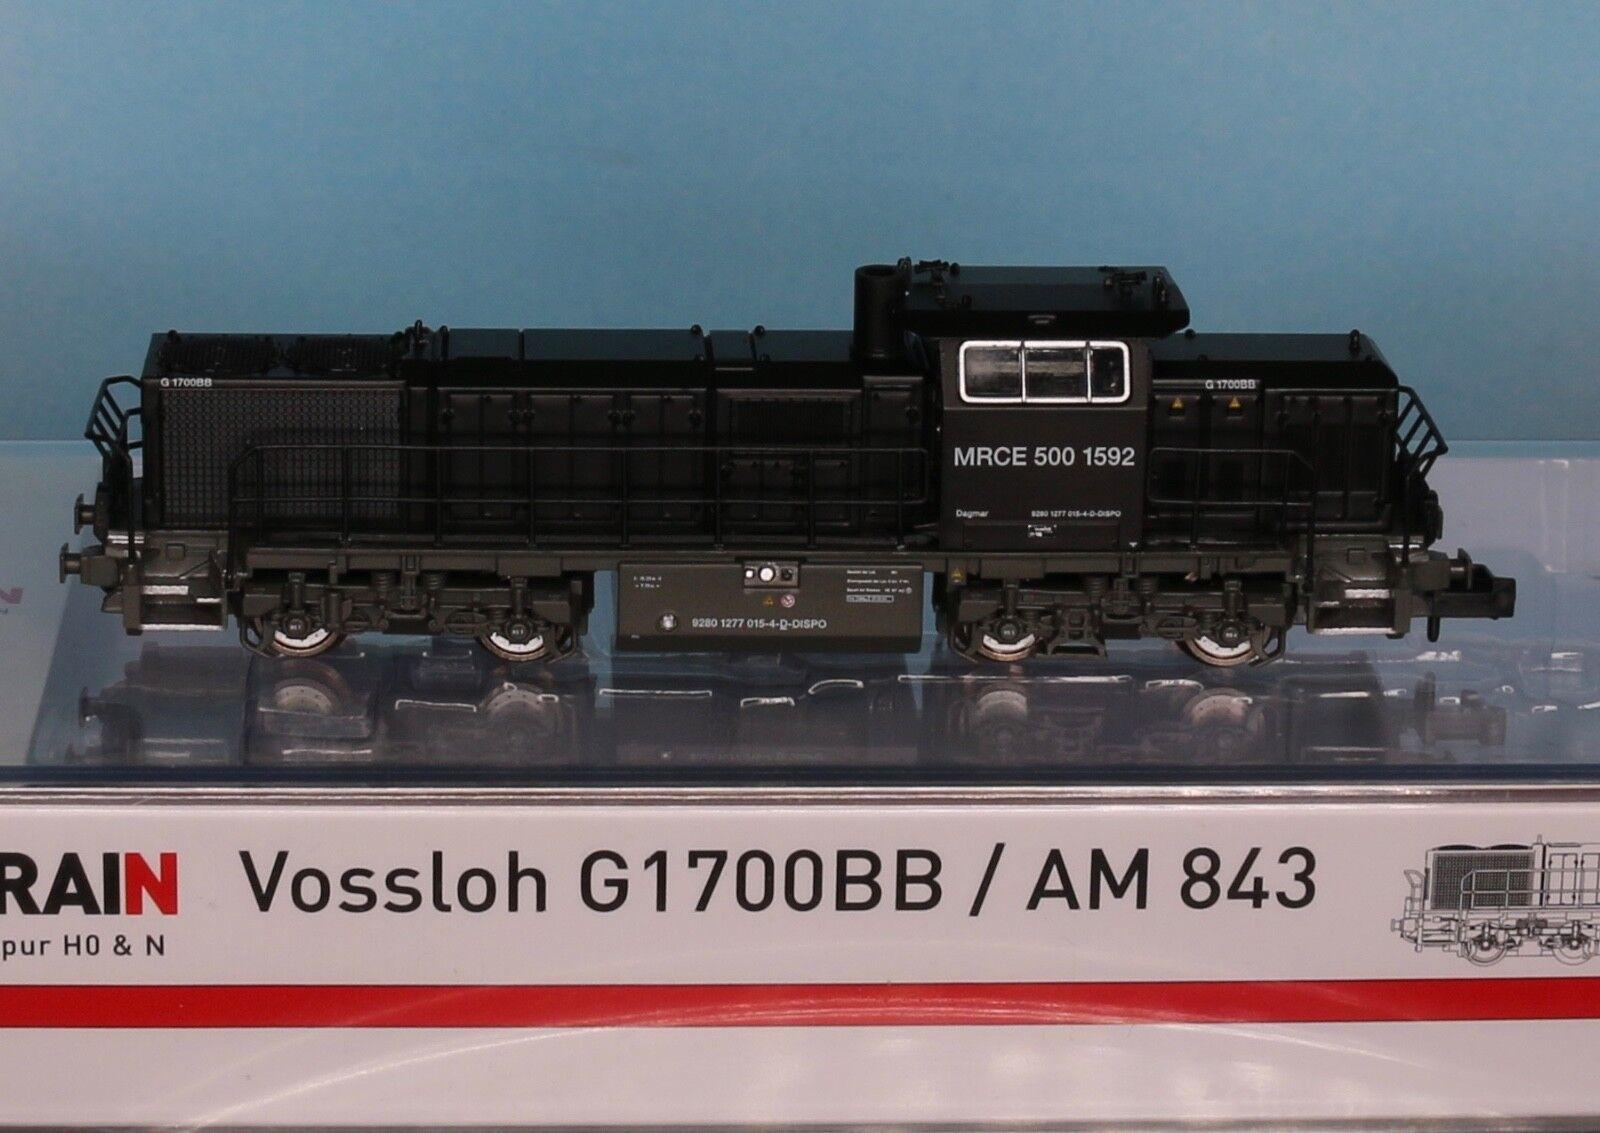 Hobbytrain Hobbytrain Hobbytrain 2942, Traccia N, Diesel MRCE g1700   5001592, ep. 6, Hobbytrain h2942 03658c